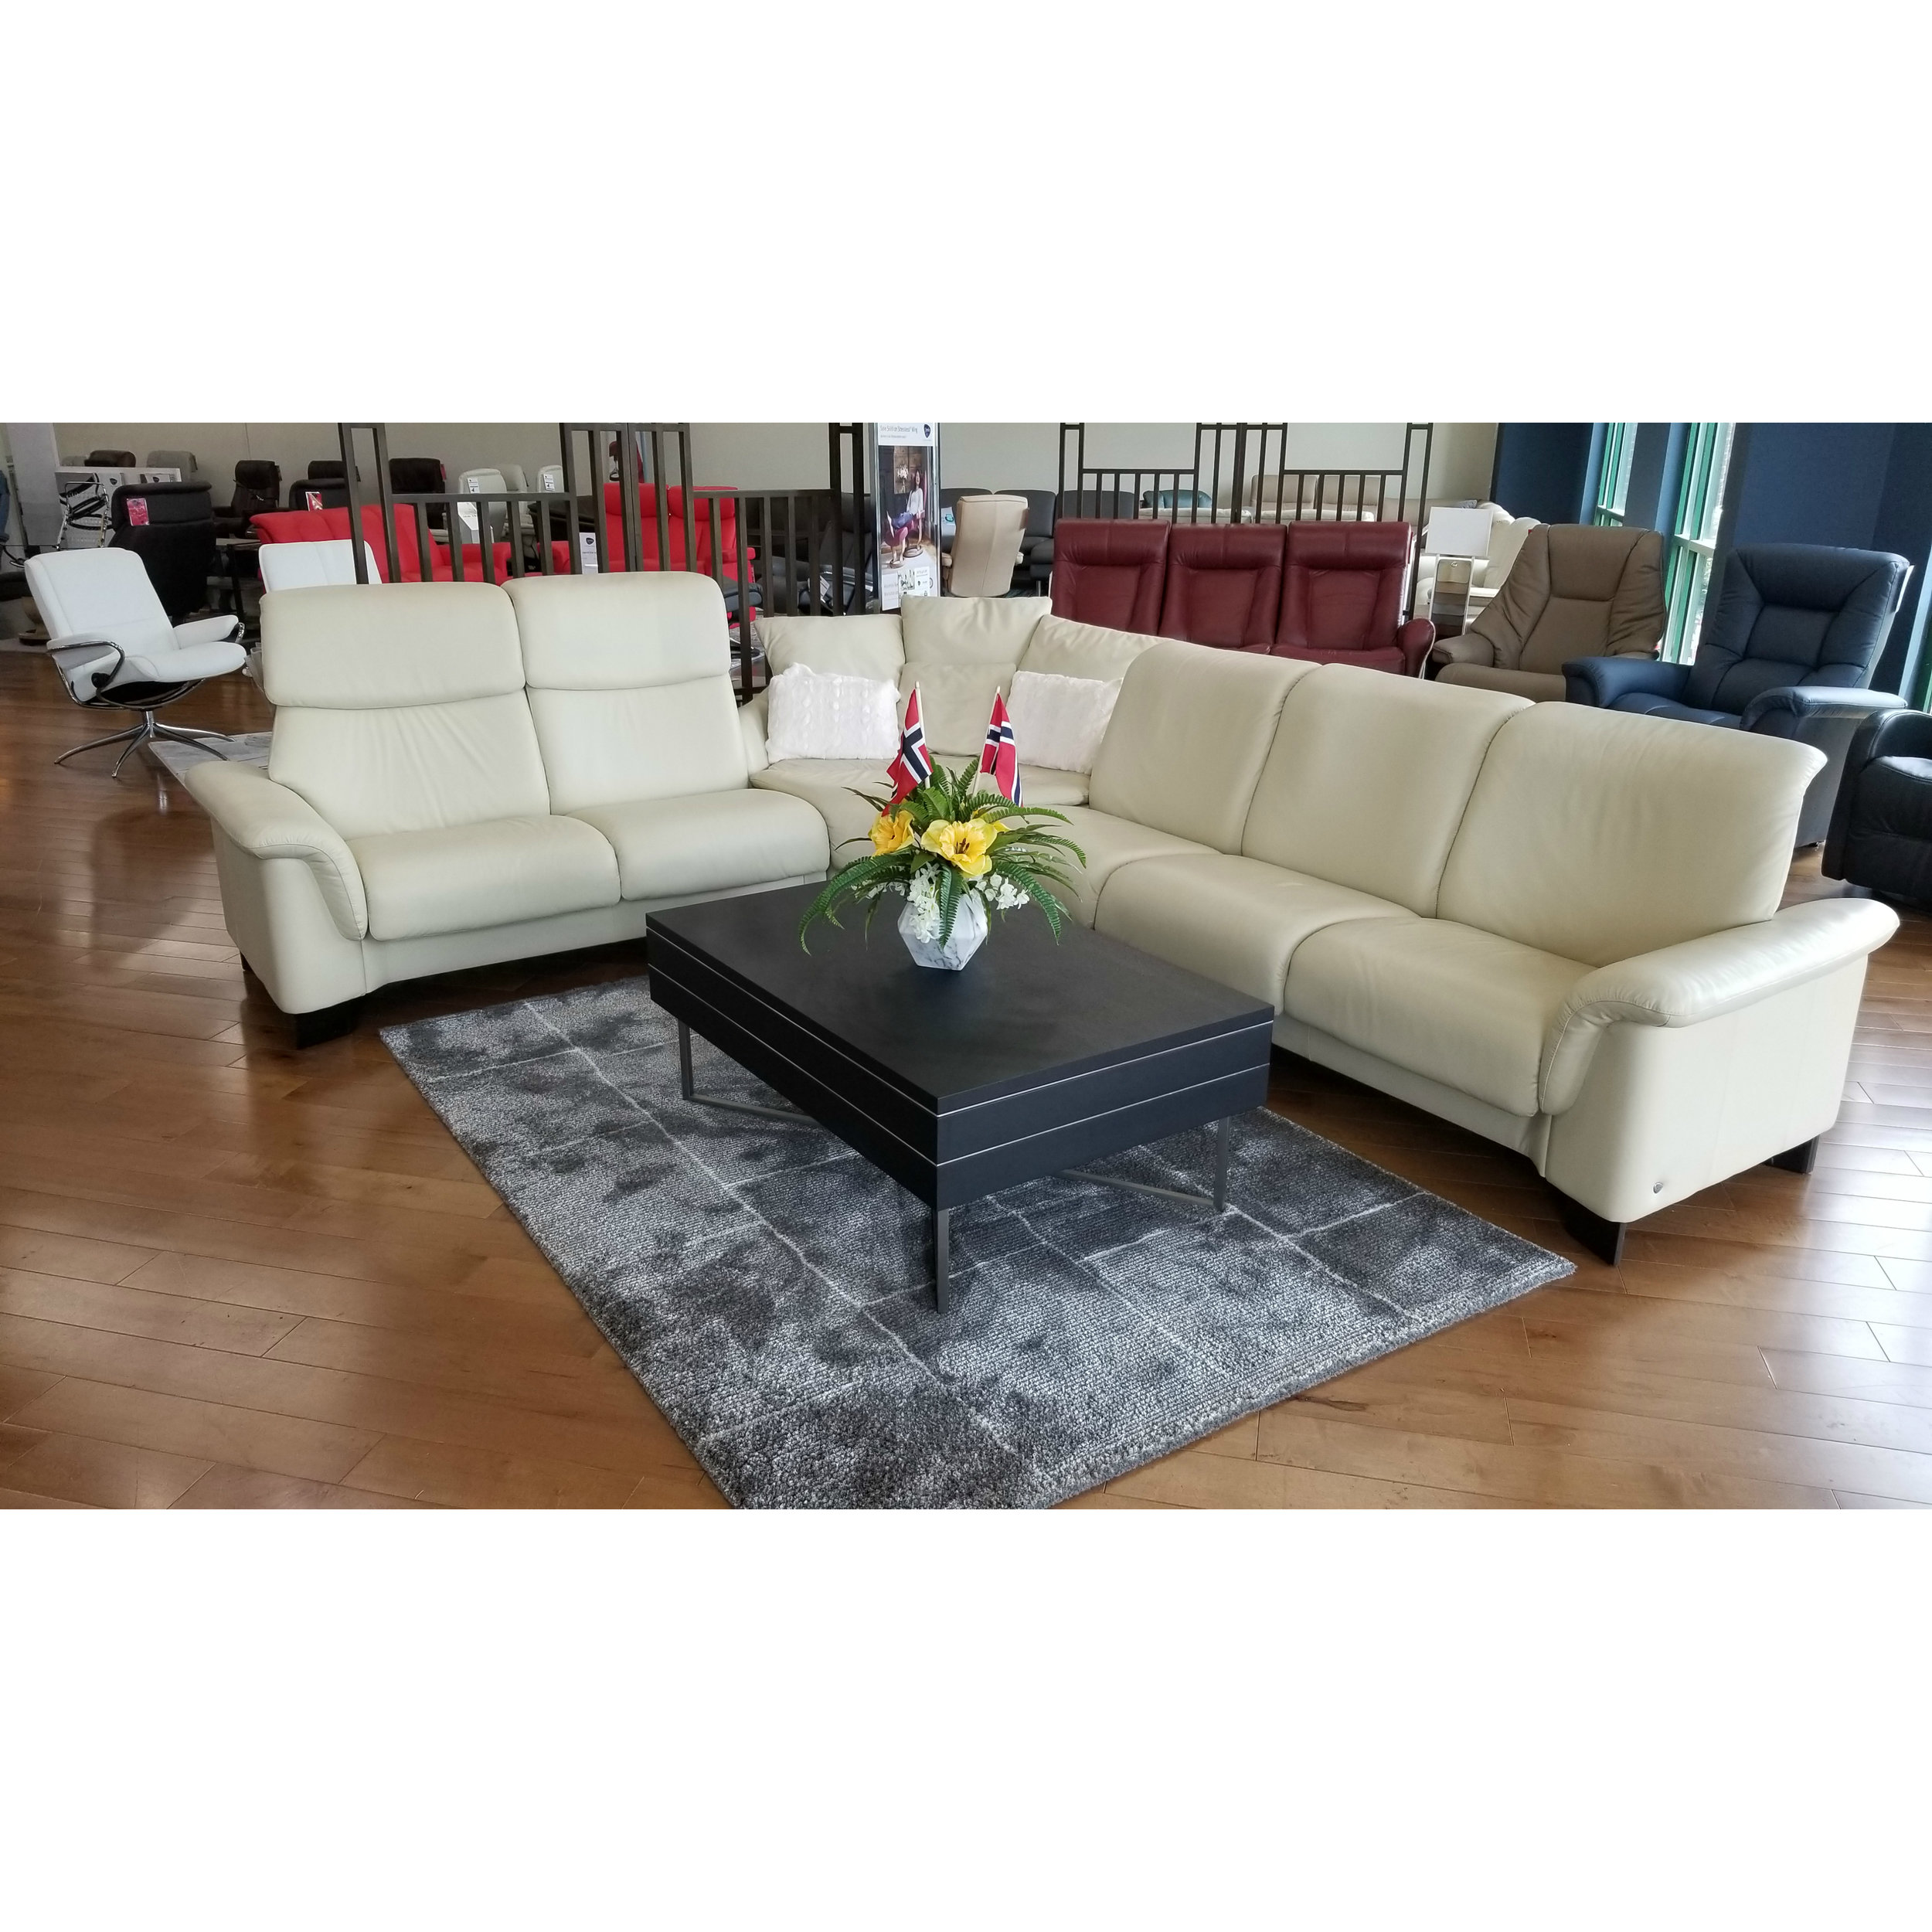 shop discount stressless recliners